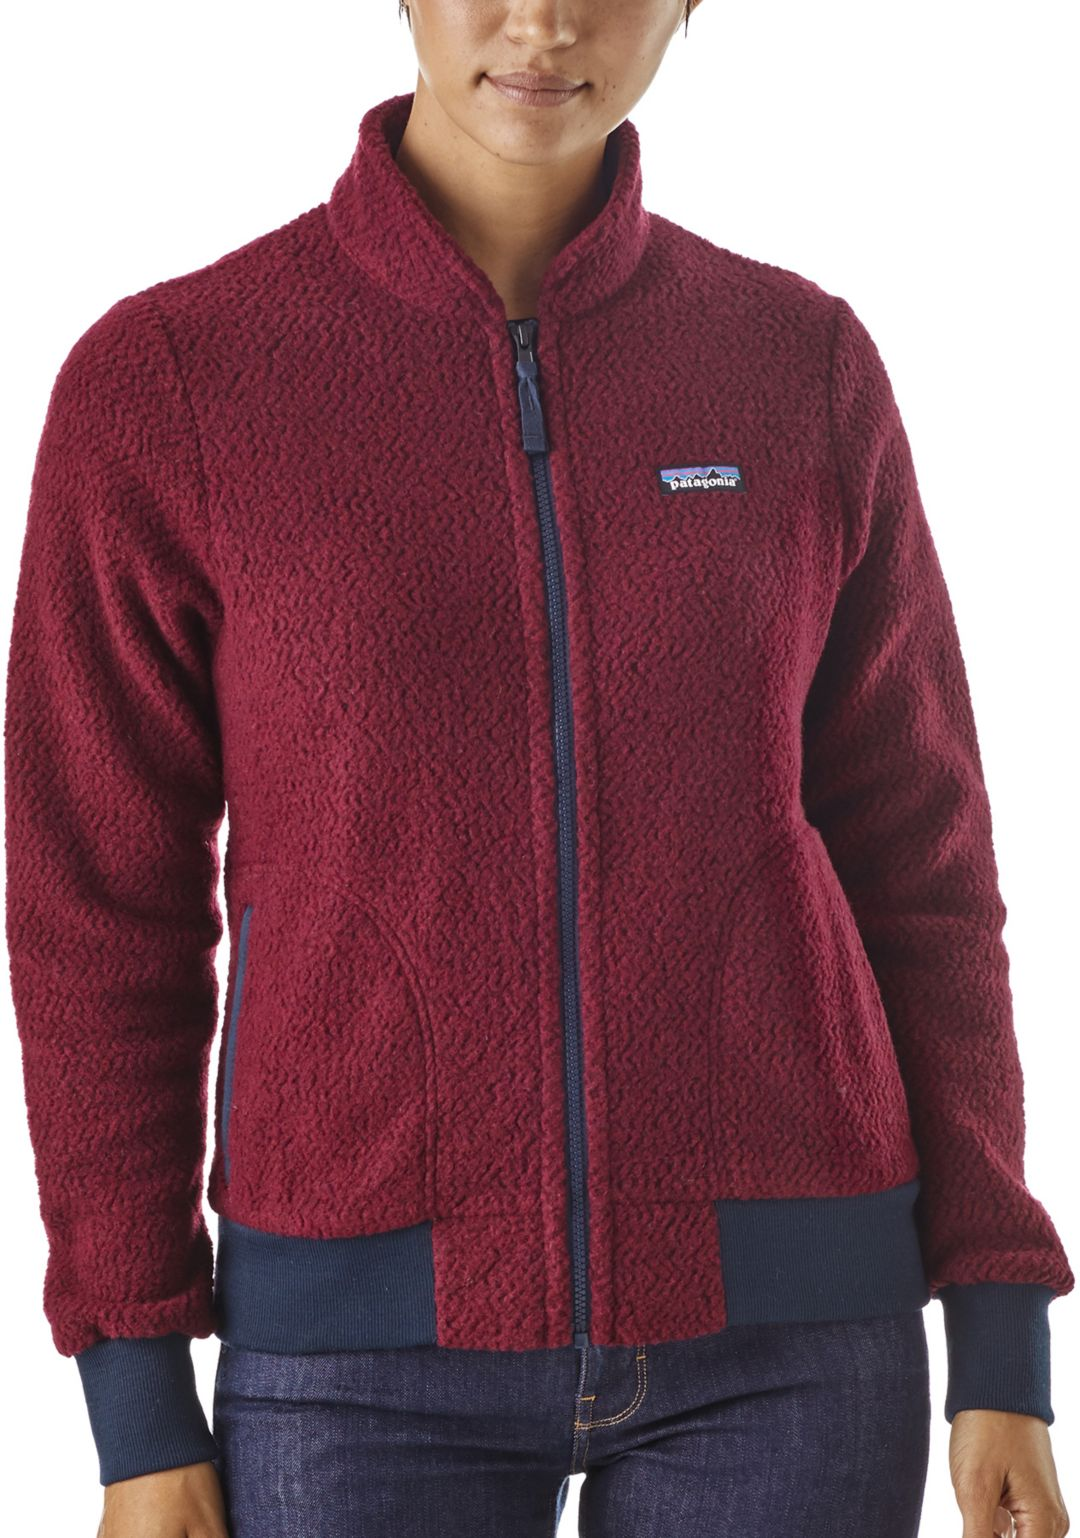 1c8562bc3414d Patagonia Women's Woolyester Fleece Jacket